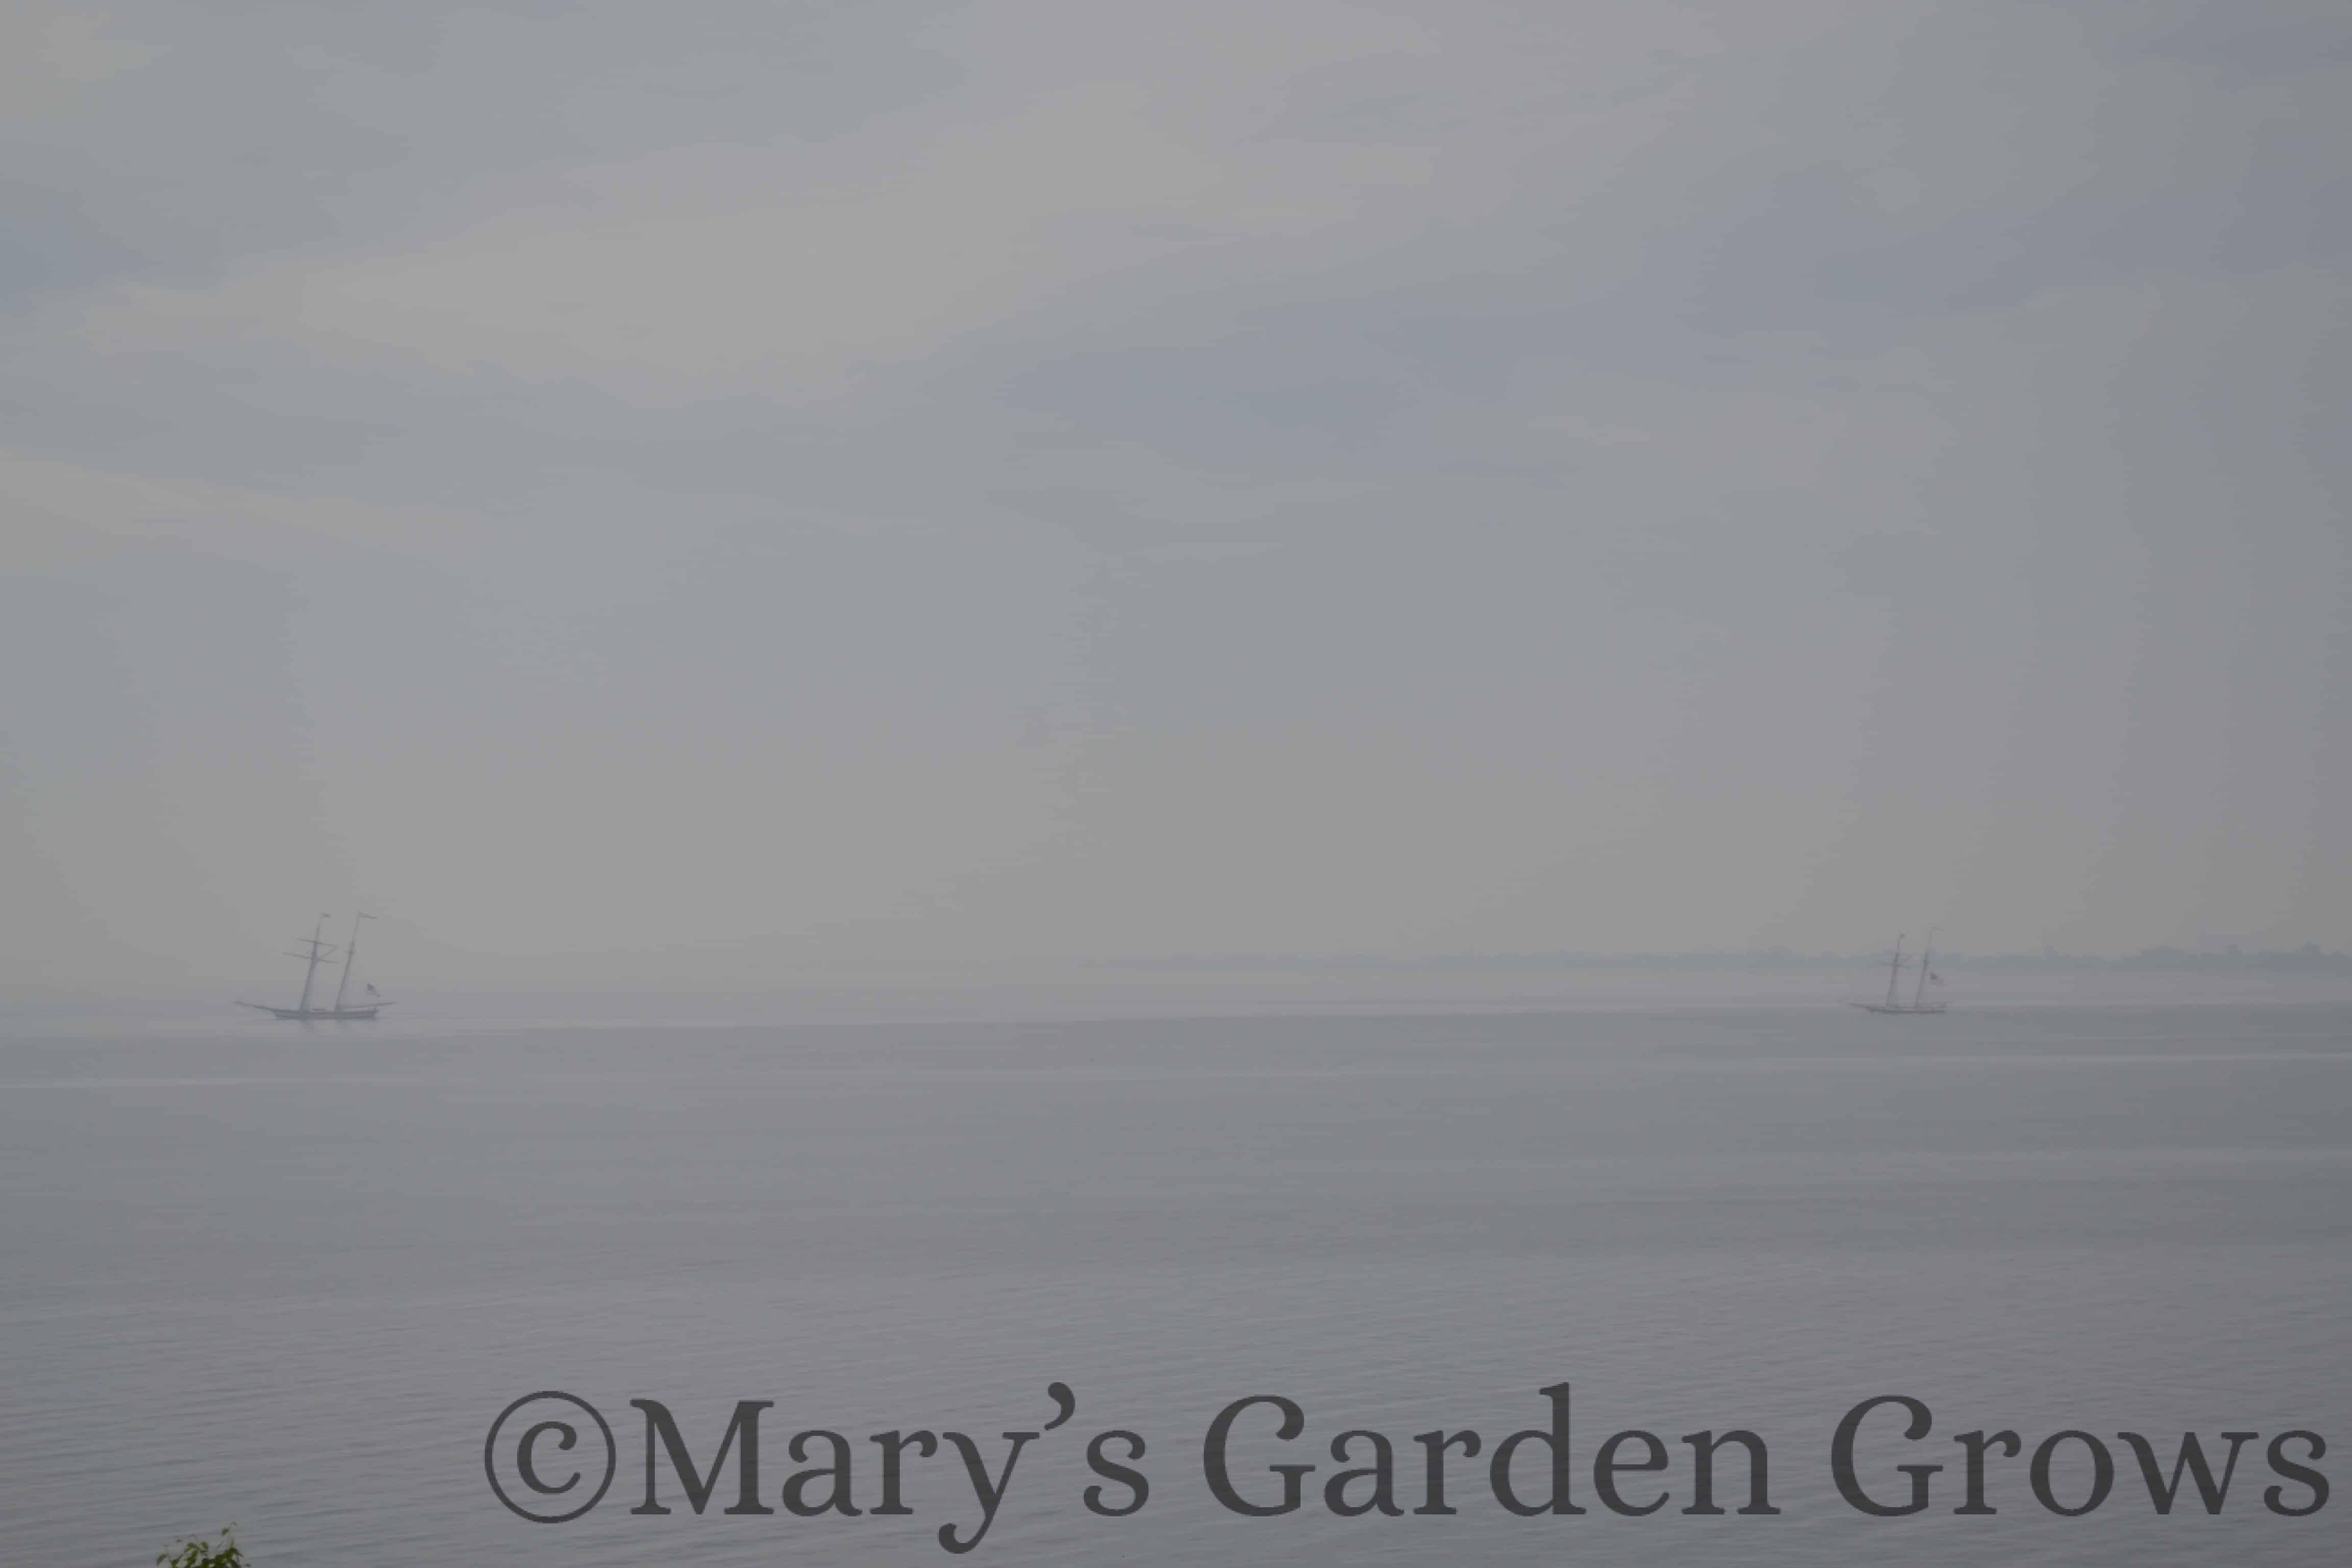 Duluth Rose Garden - Old Ships